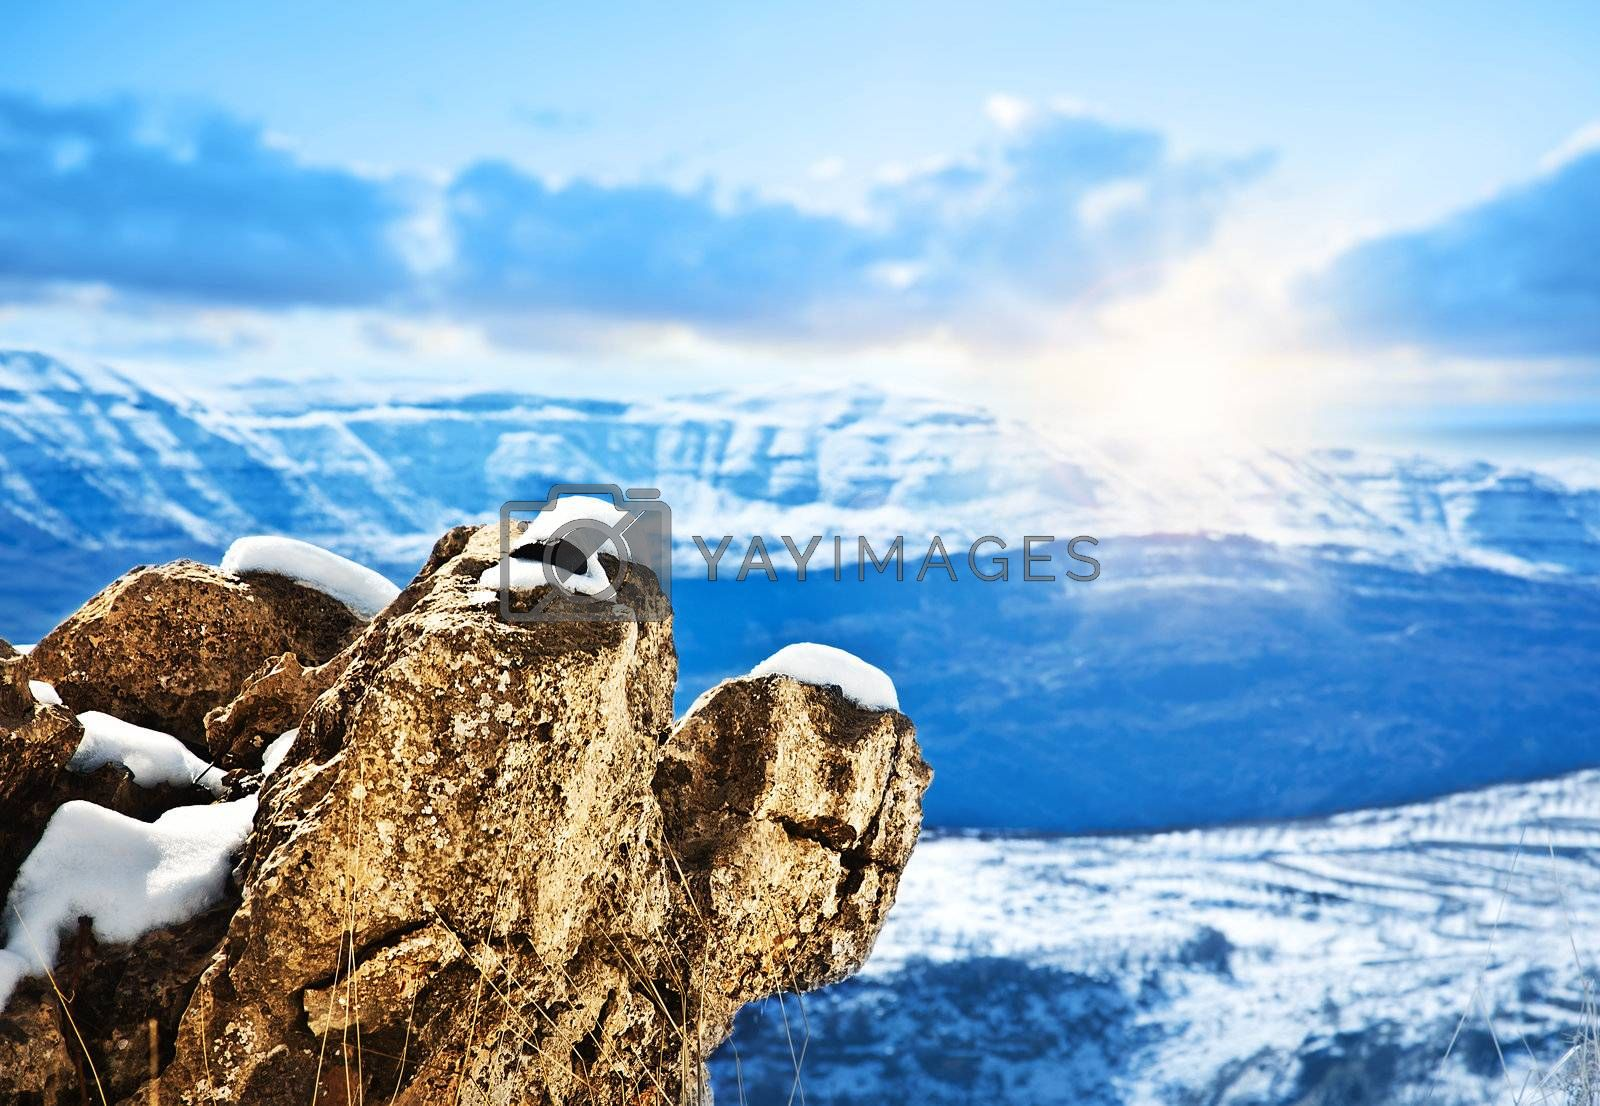 Beautiful winter mountains landscape by Anna_Omelchenko